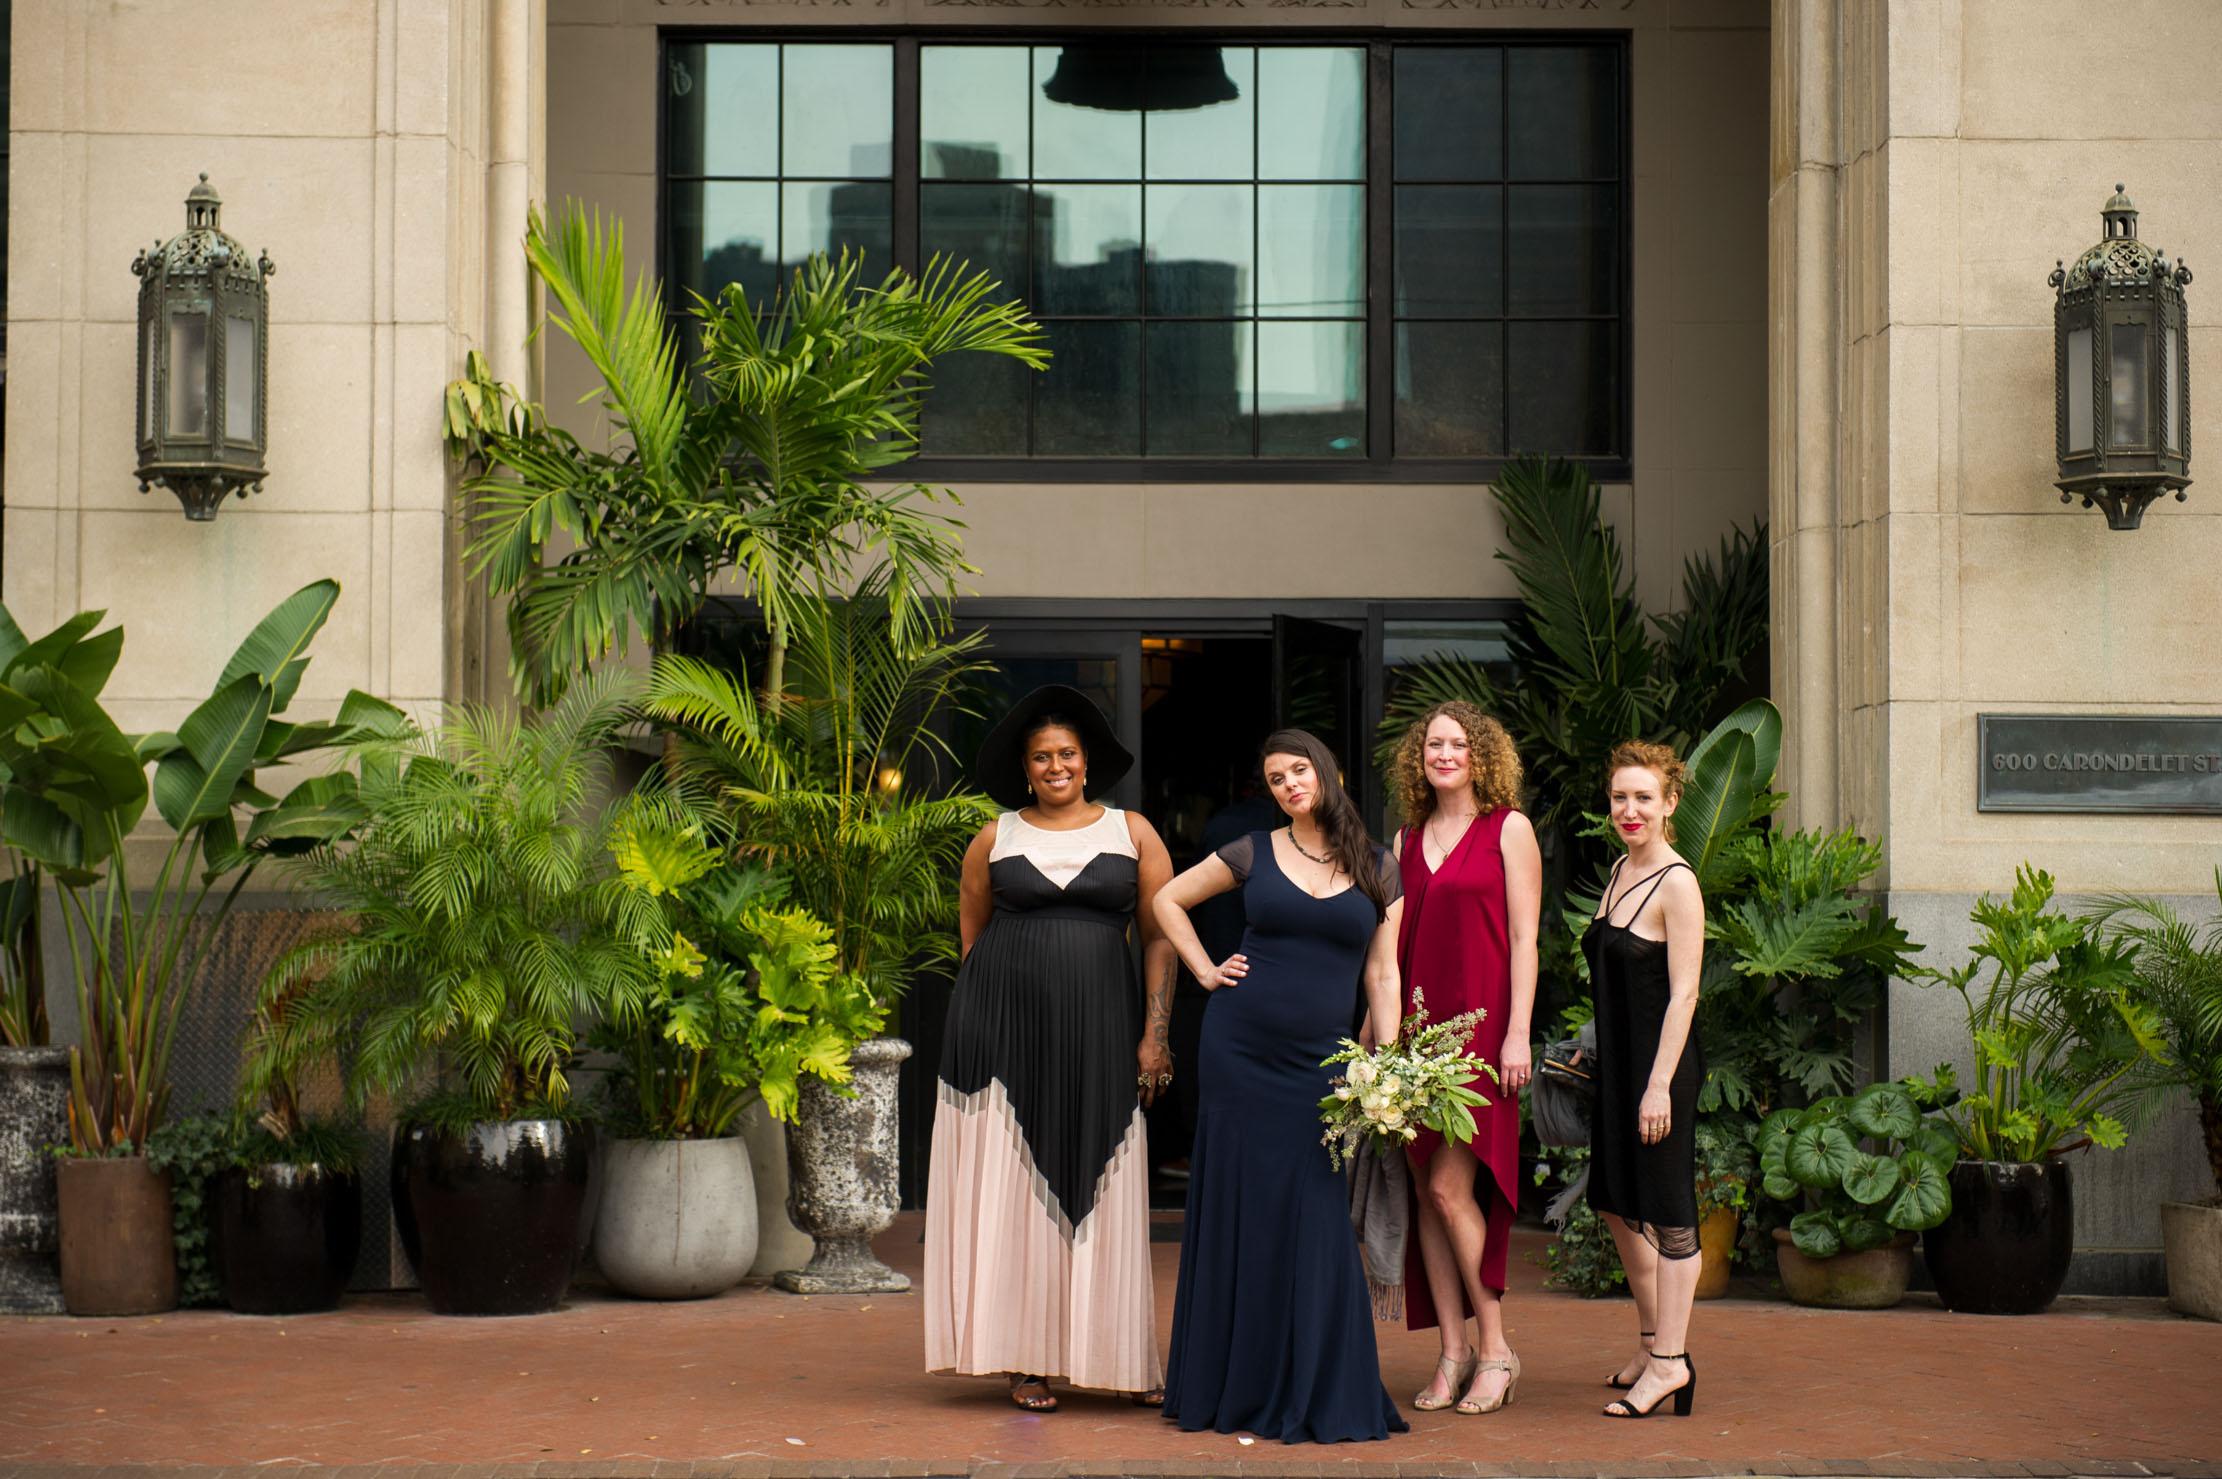 NOLA-Felicity-Church-Ace-Hotel-Wedding-1032.jpg